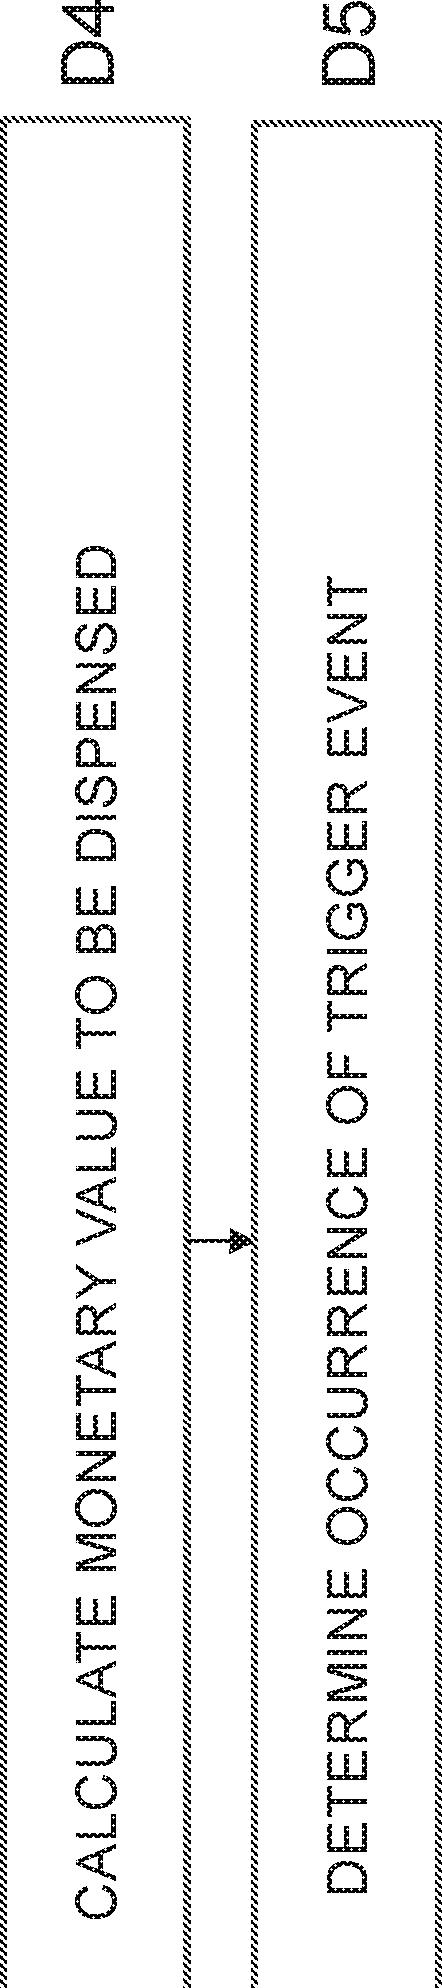 Figure GB2557237A_D0013